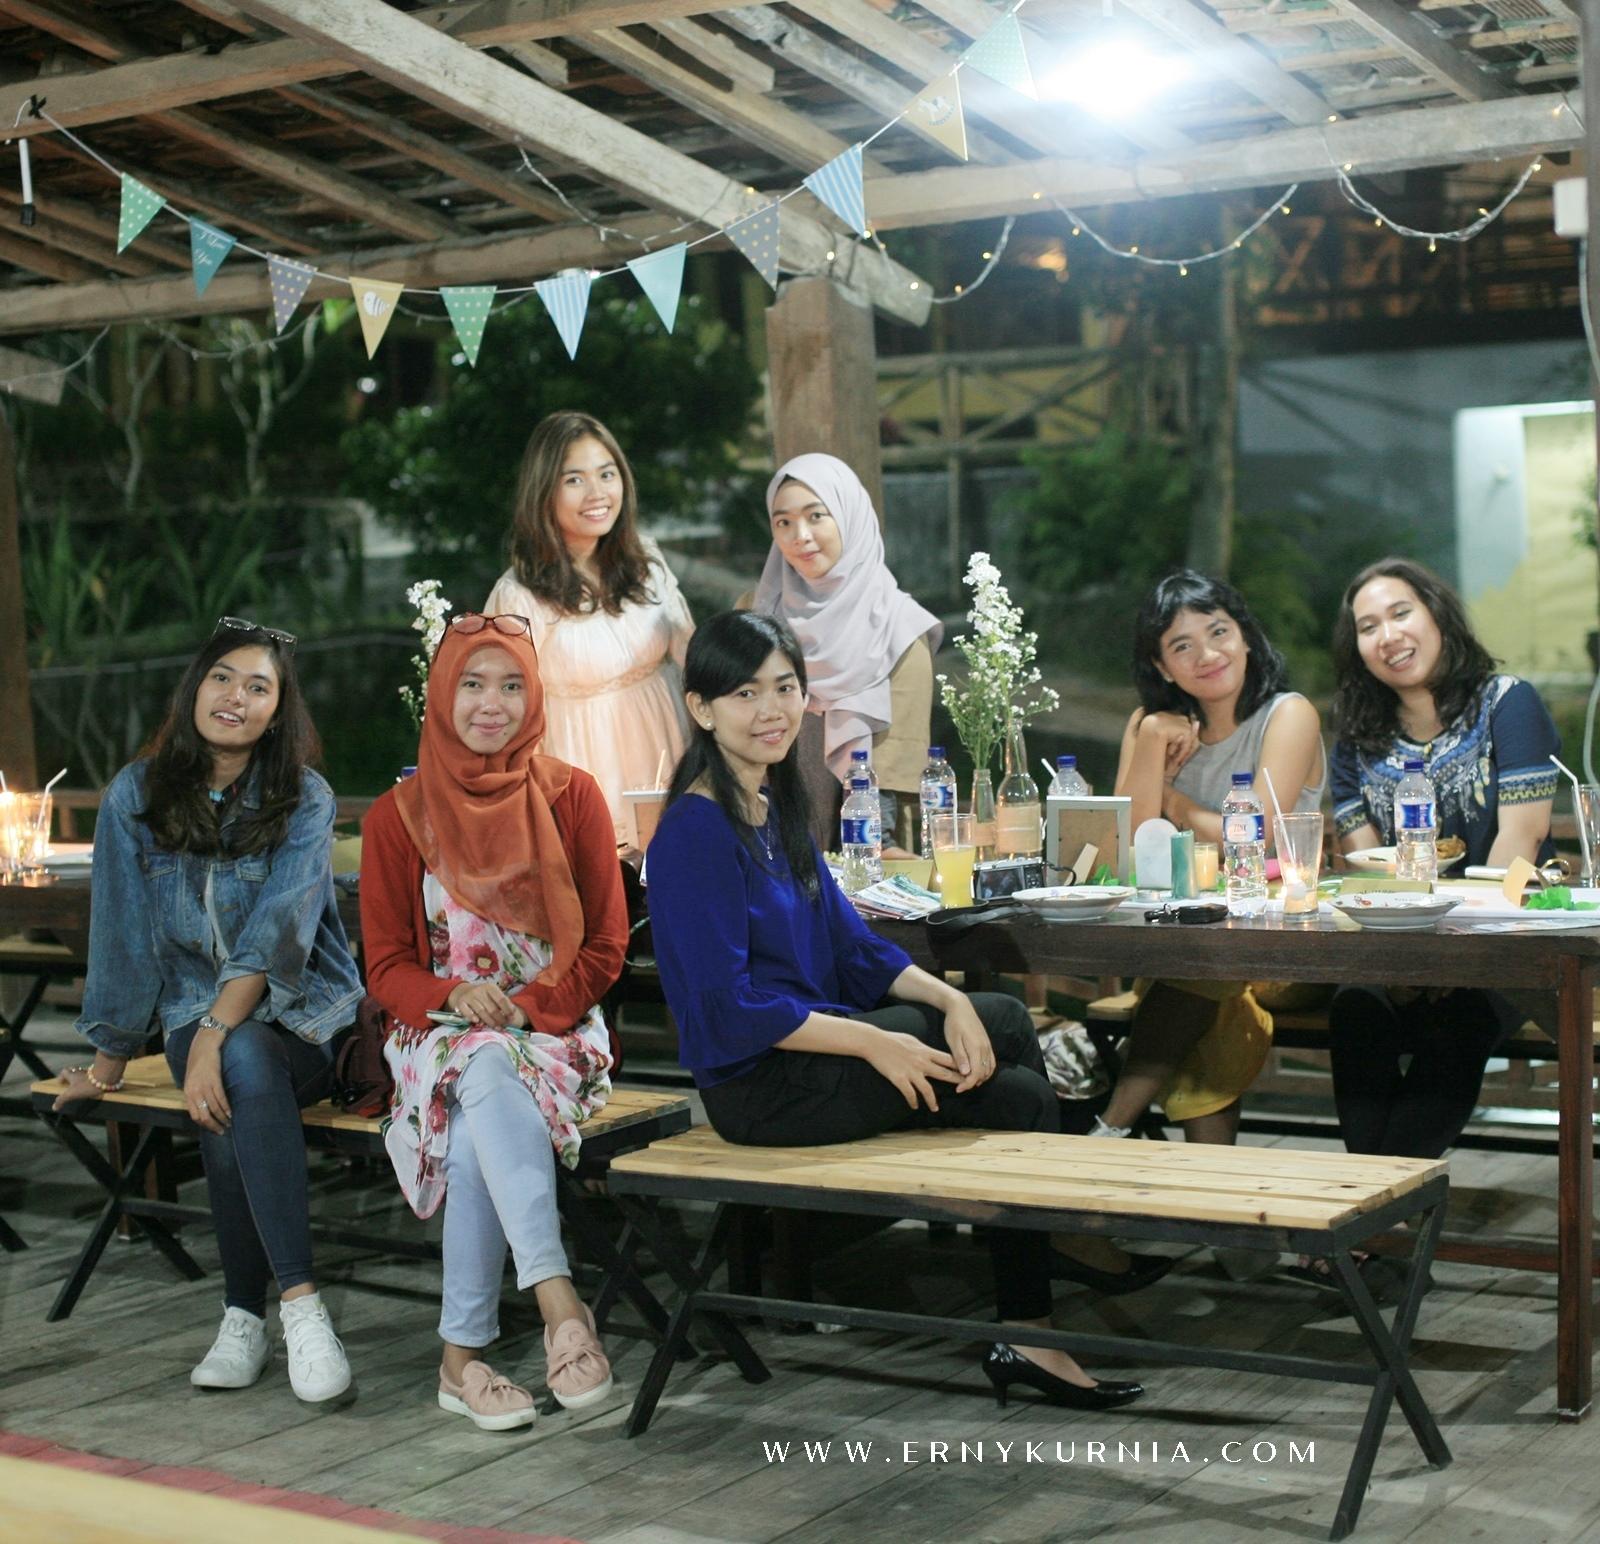 Jogja Bloggirls, Blogger Community Jogja, Blogger, Bloger Jogja, Bloger Perempuan